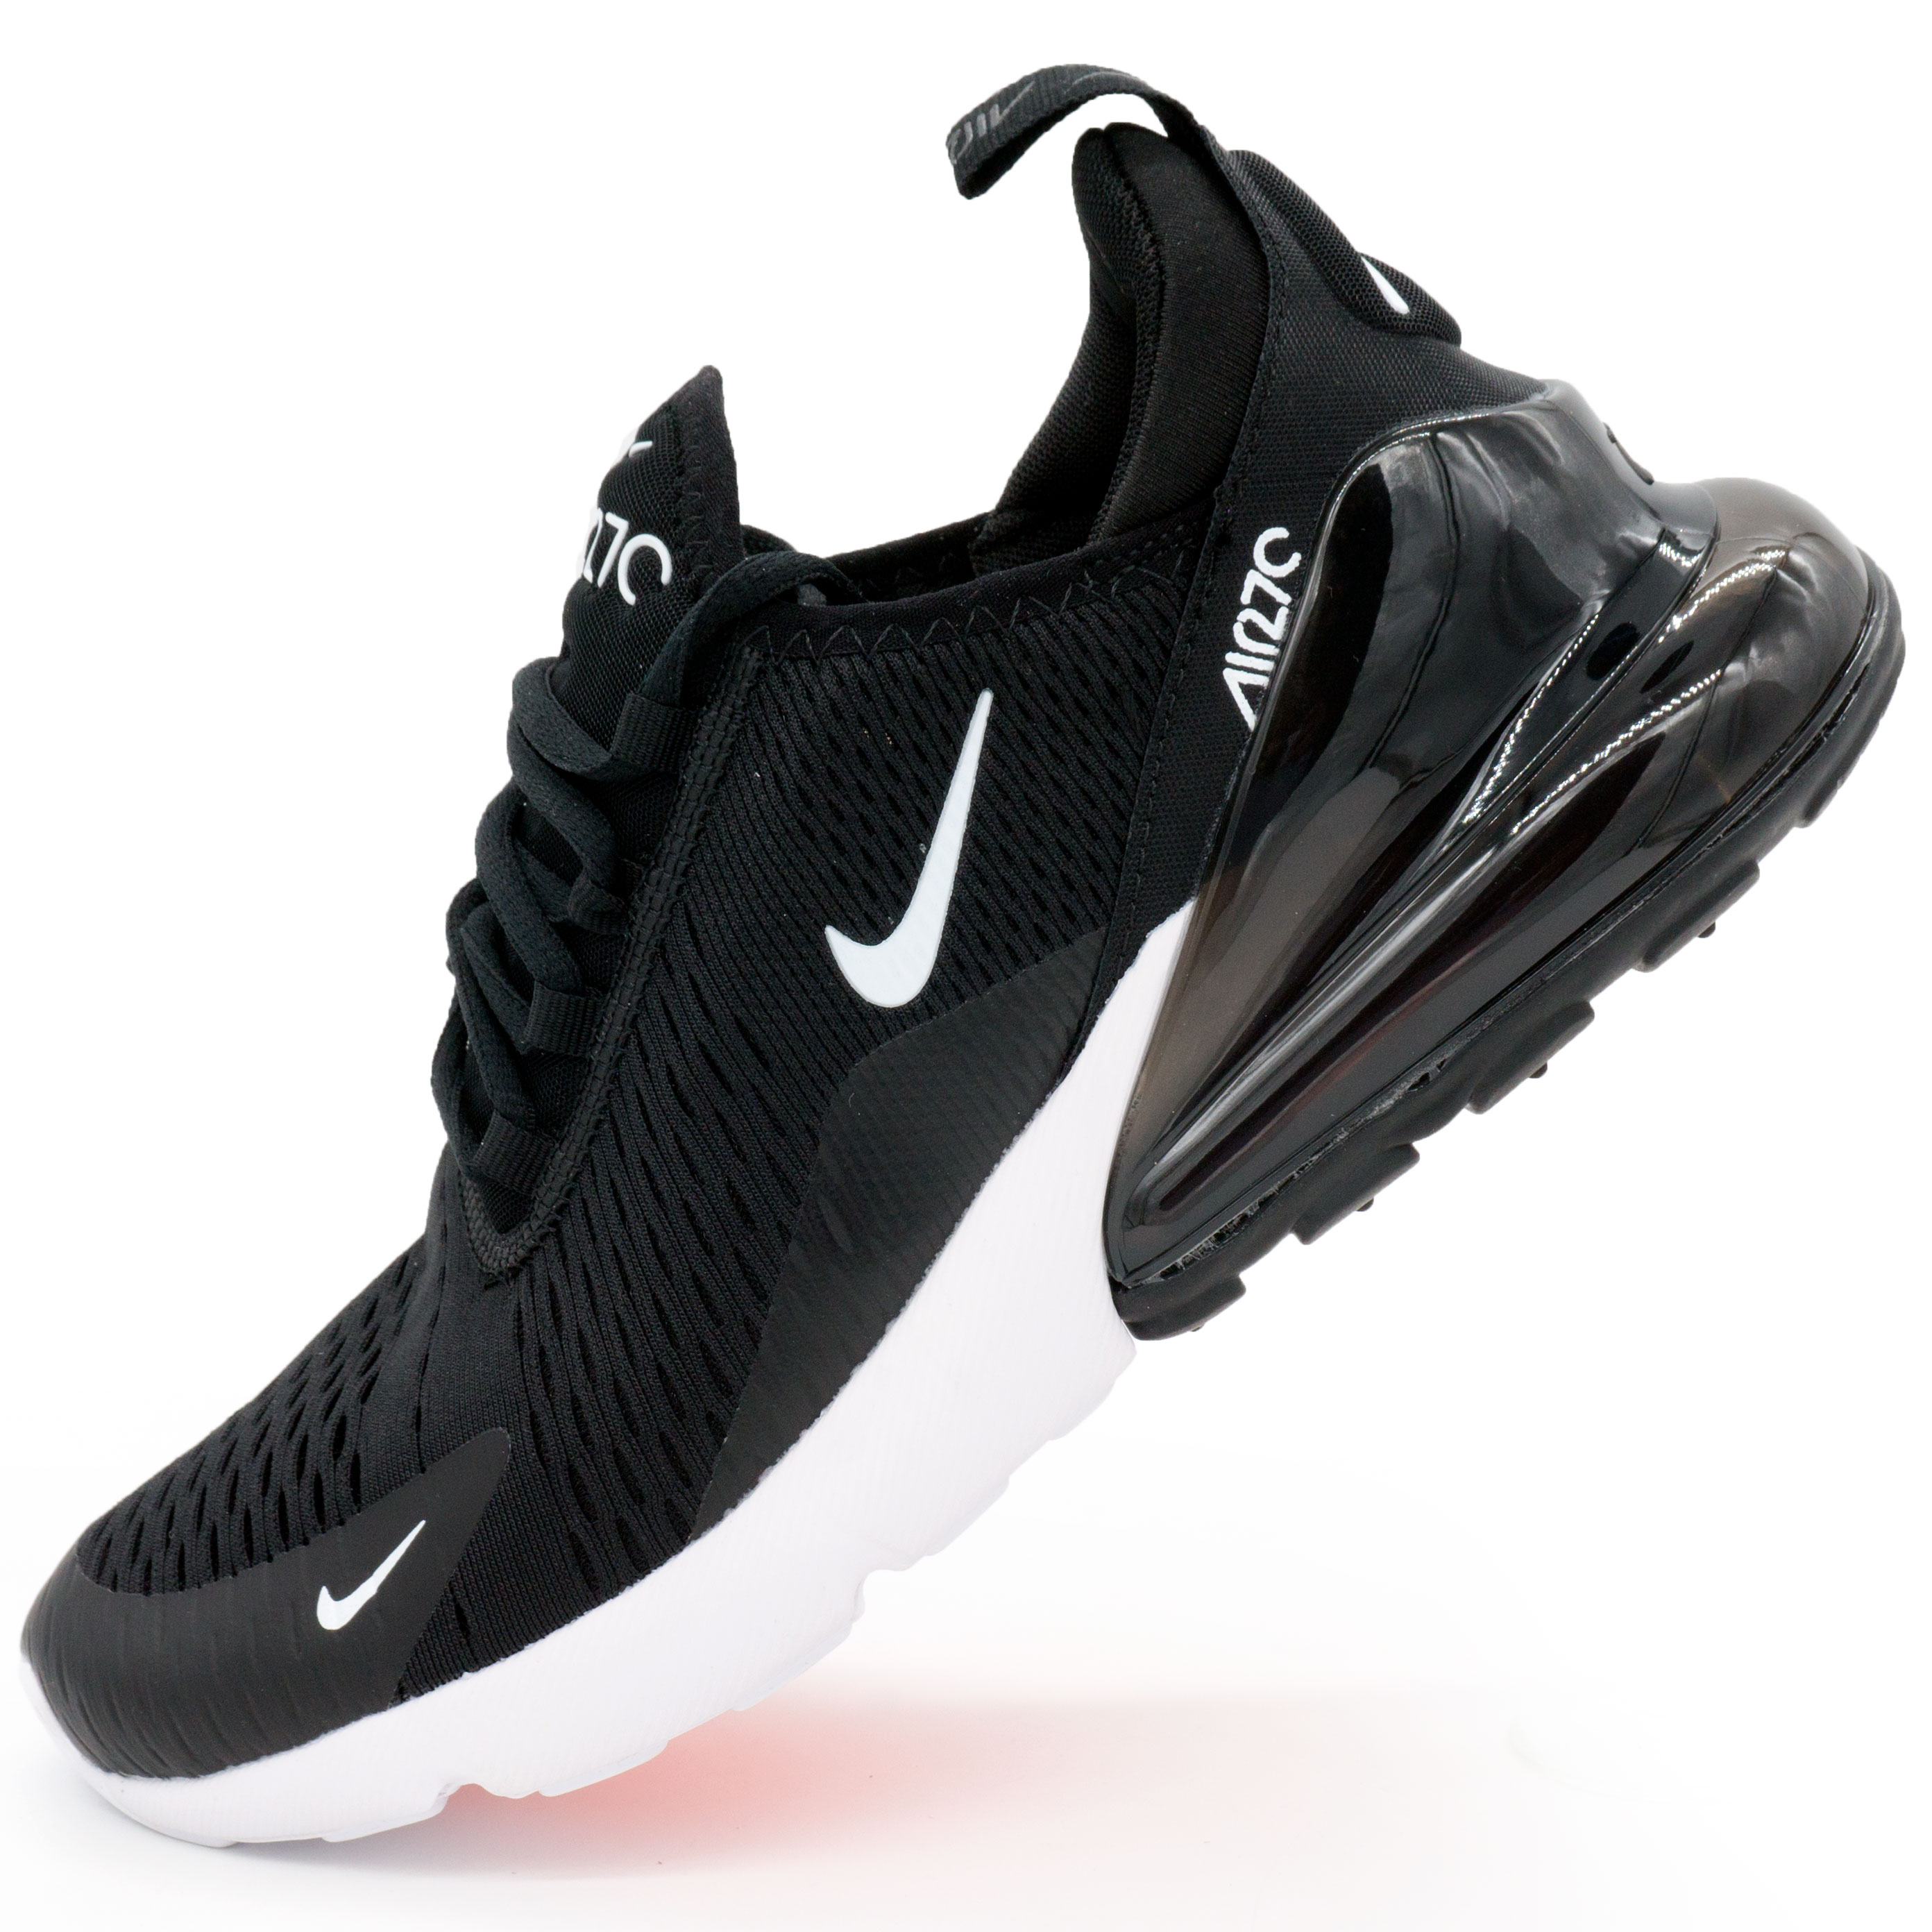 00070152 Топ качество! фото main Кроссовки Nike Air Max 270 Flyknit черно белые.